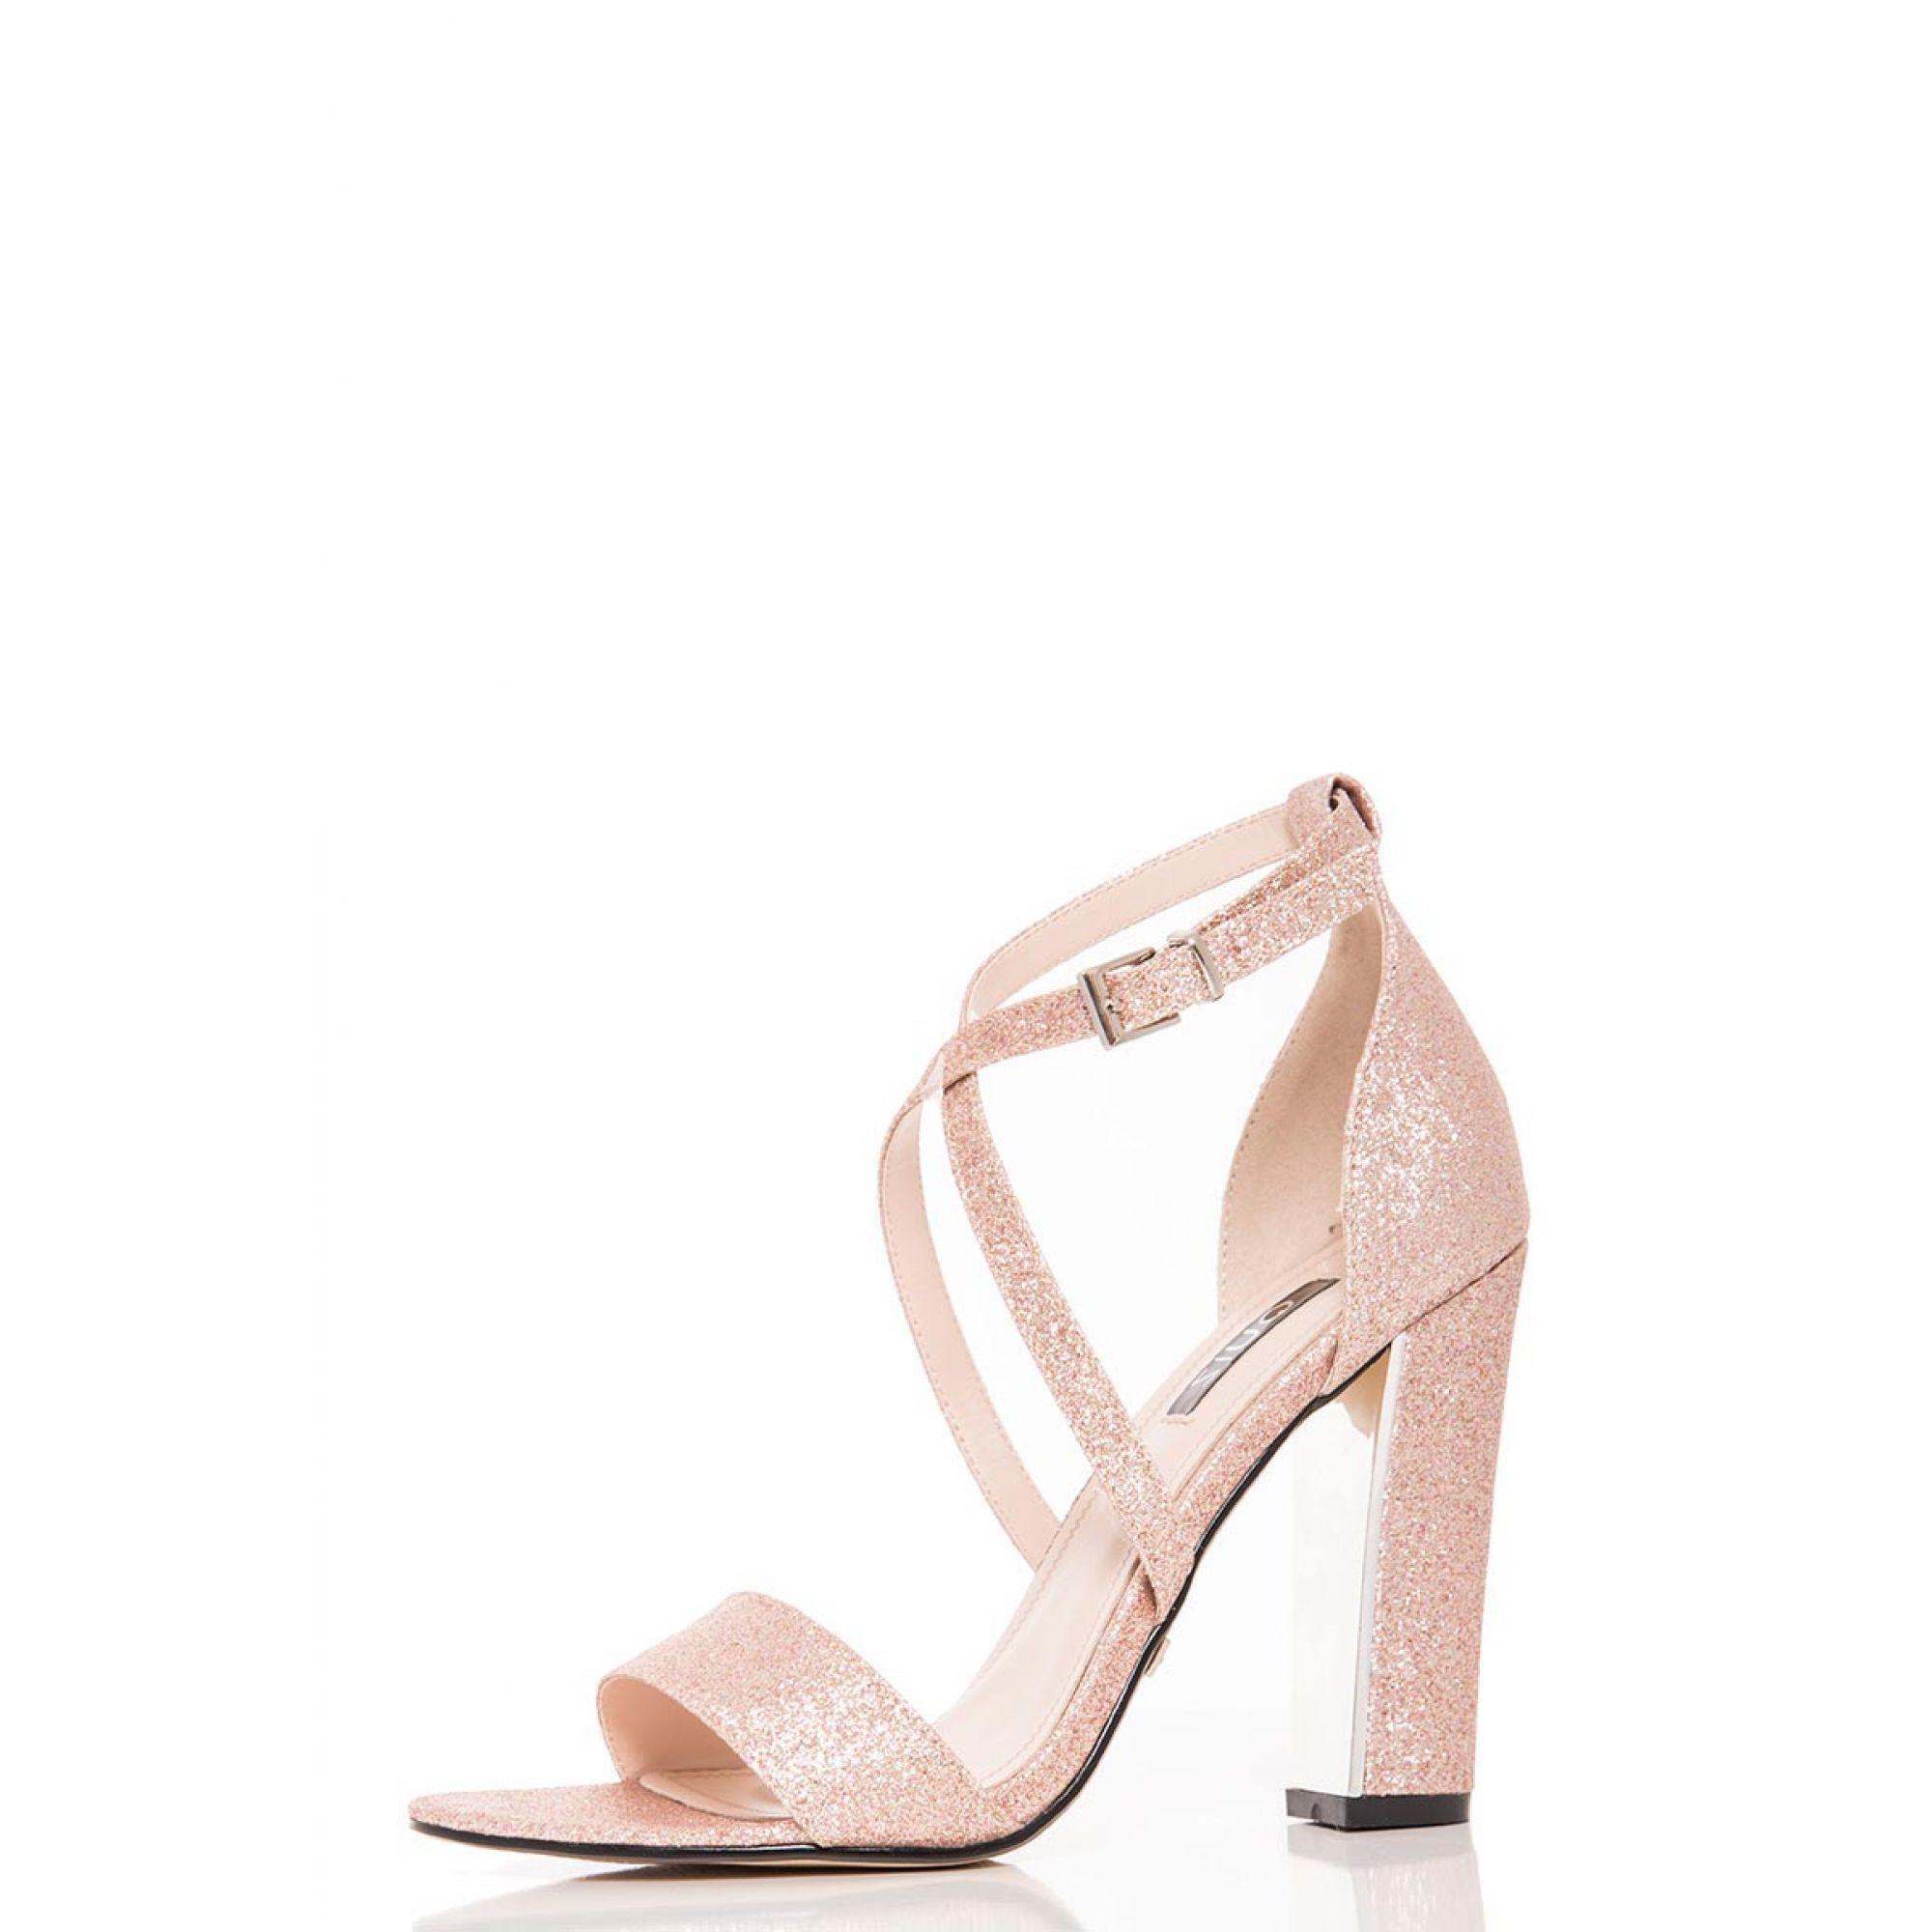 f7a35493b09e Quiz - Metallic Rose Gold Glitter Block Heel Strappy Sandals - Lyst. View  fullscreen